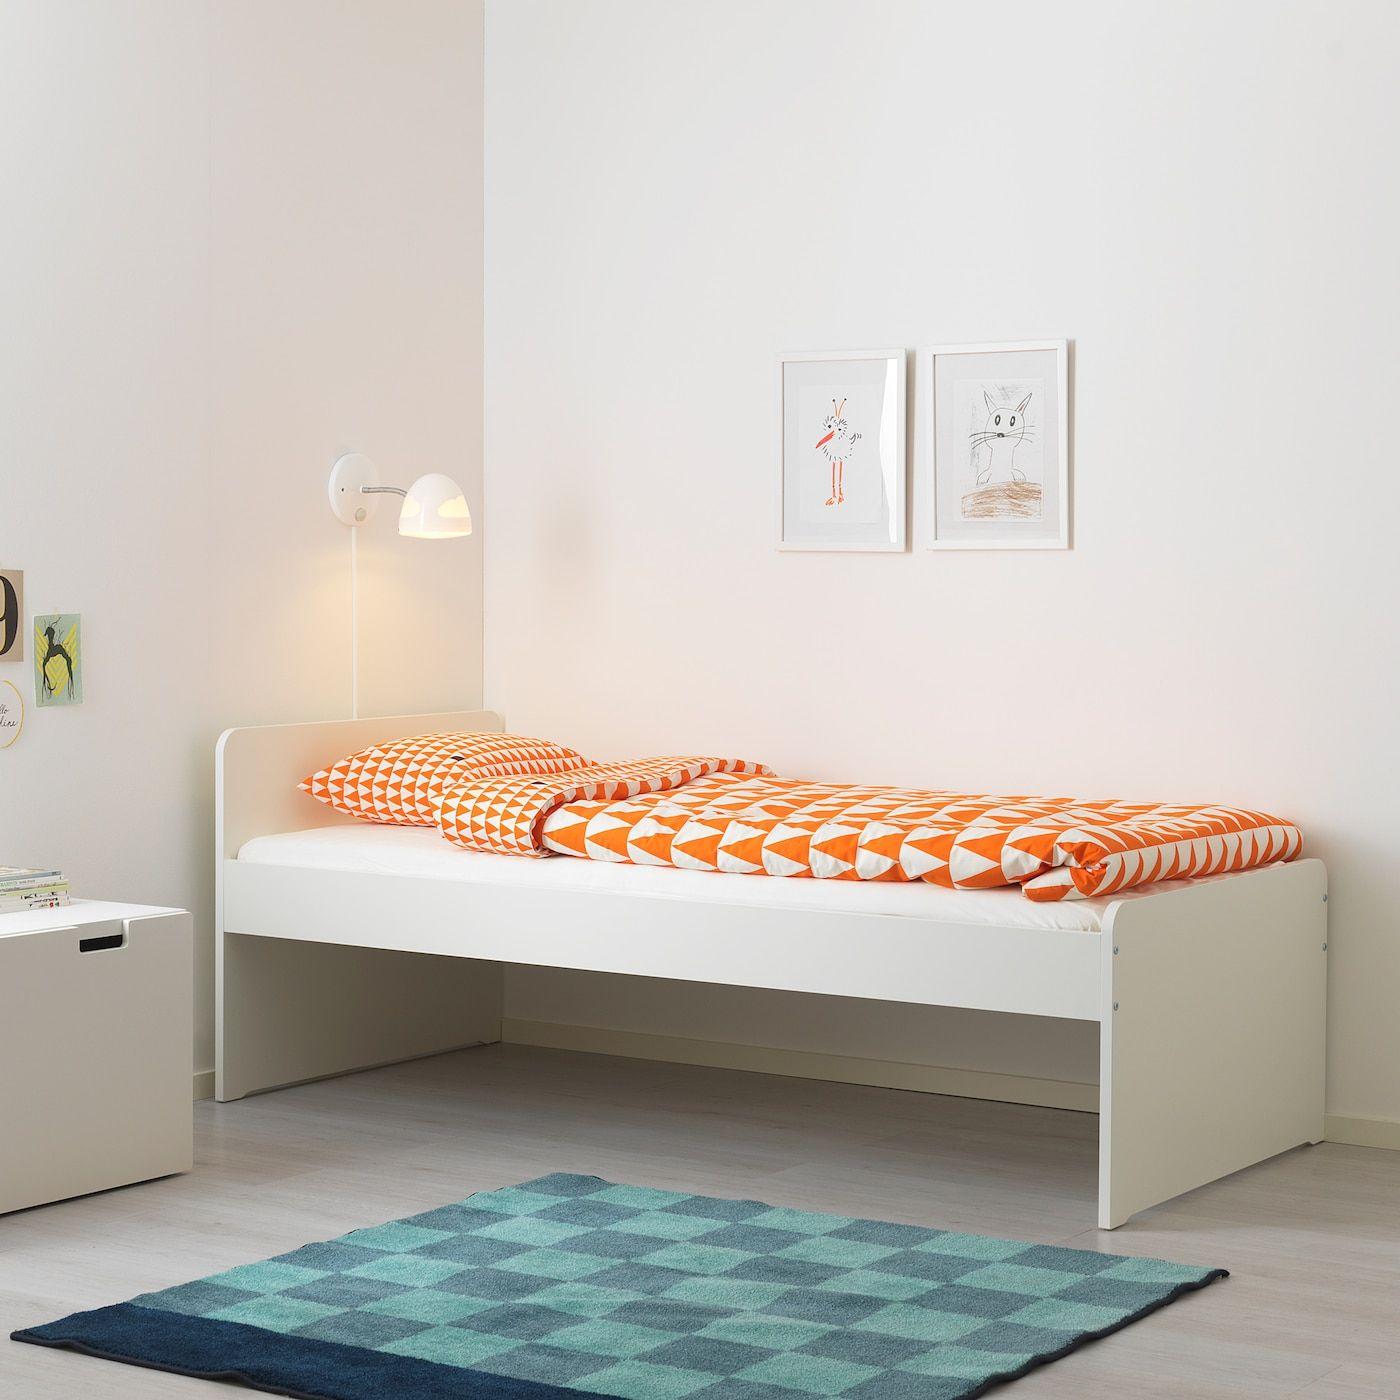 Slakt Bettgestell Mit Federholzrahmen Weiss Ikea Osterreich In 2020 Bed Frame White Bed Frame Single Bed Frame